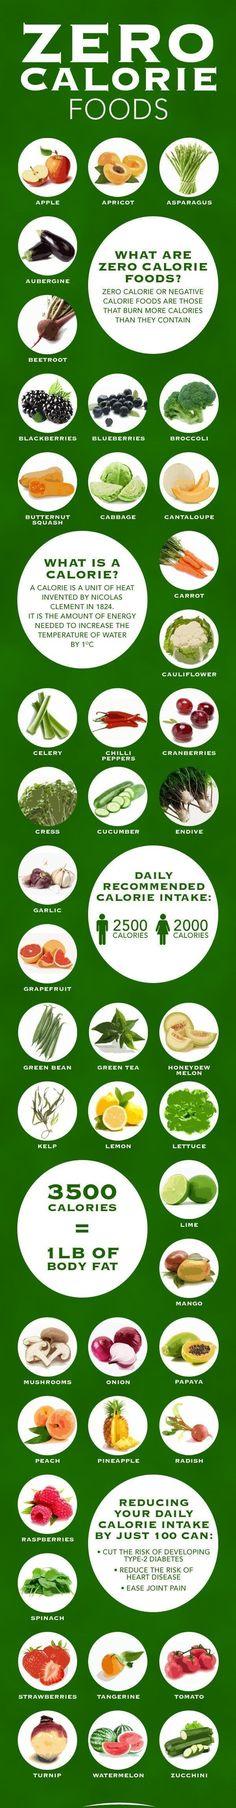 negative calorie foods #naturalskincare #healthyskin #skincareproducts #Australianskincare #AqiskinCare